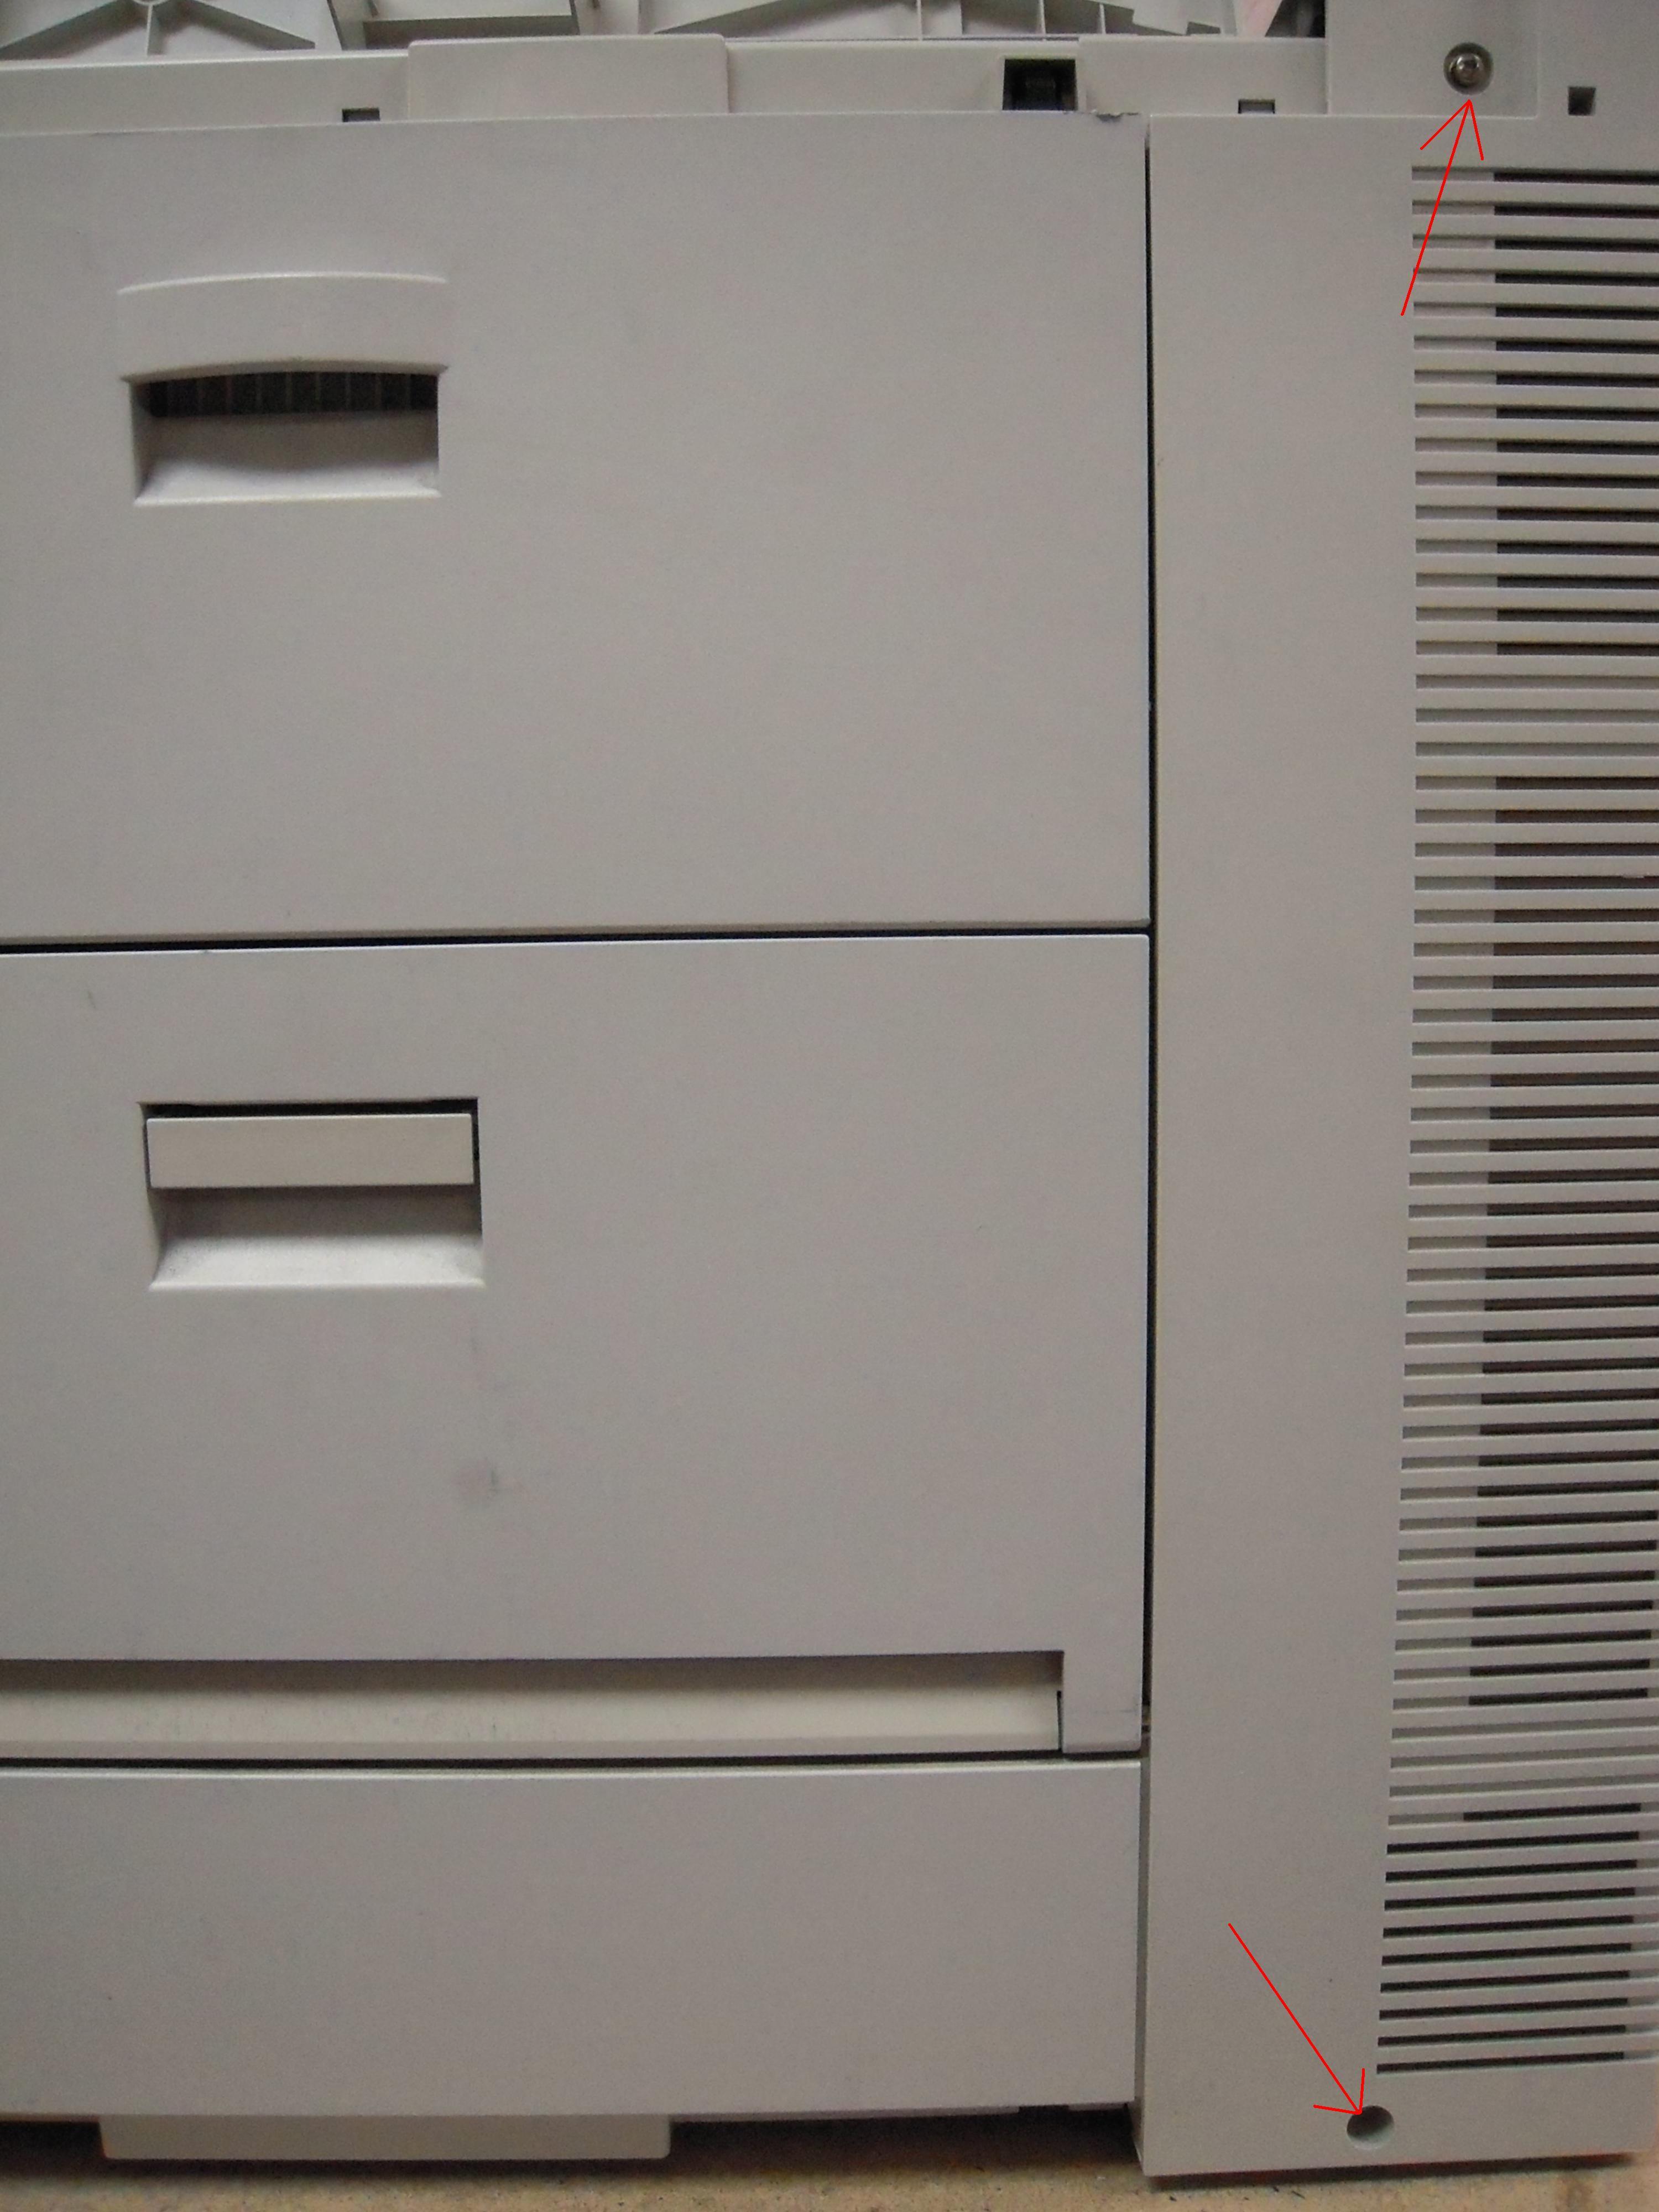 hp laserjet 8100 printer manual